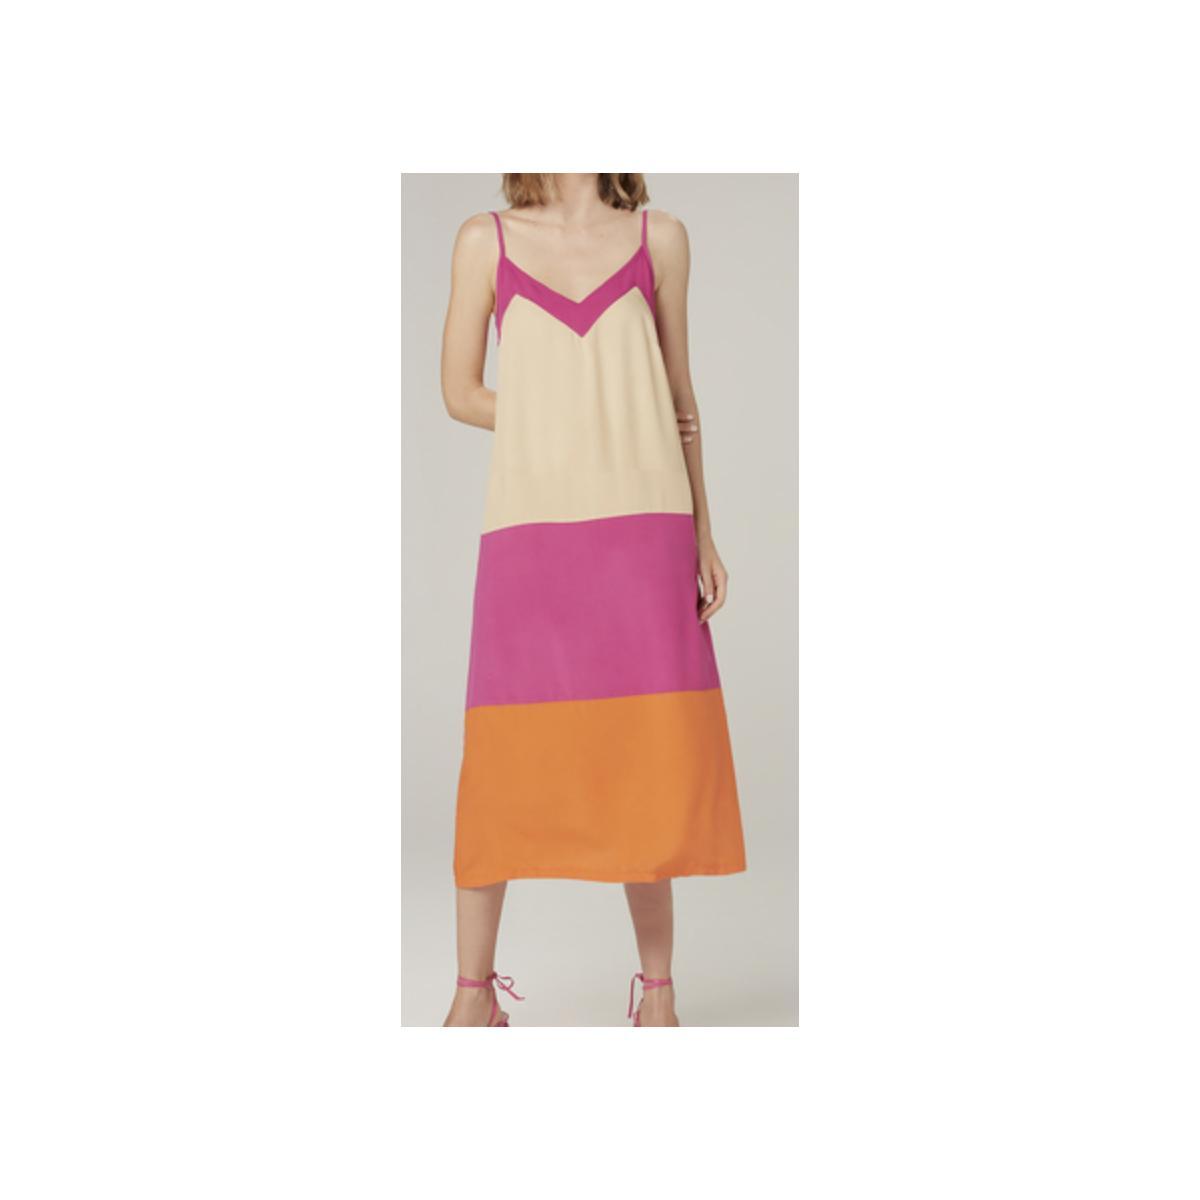 Vestido Feminino Dzarm Zaty 1aen  Bege/roxo/laranja